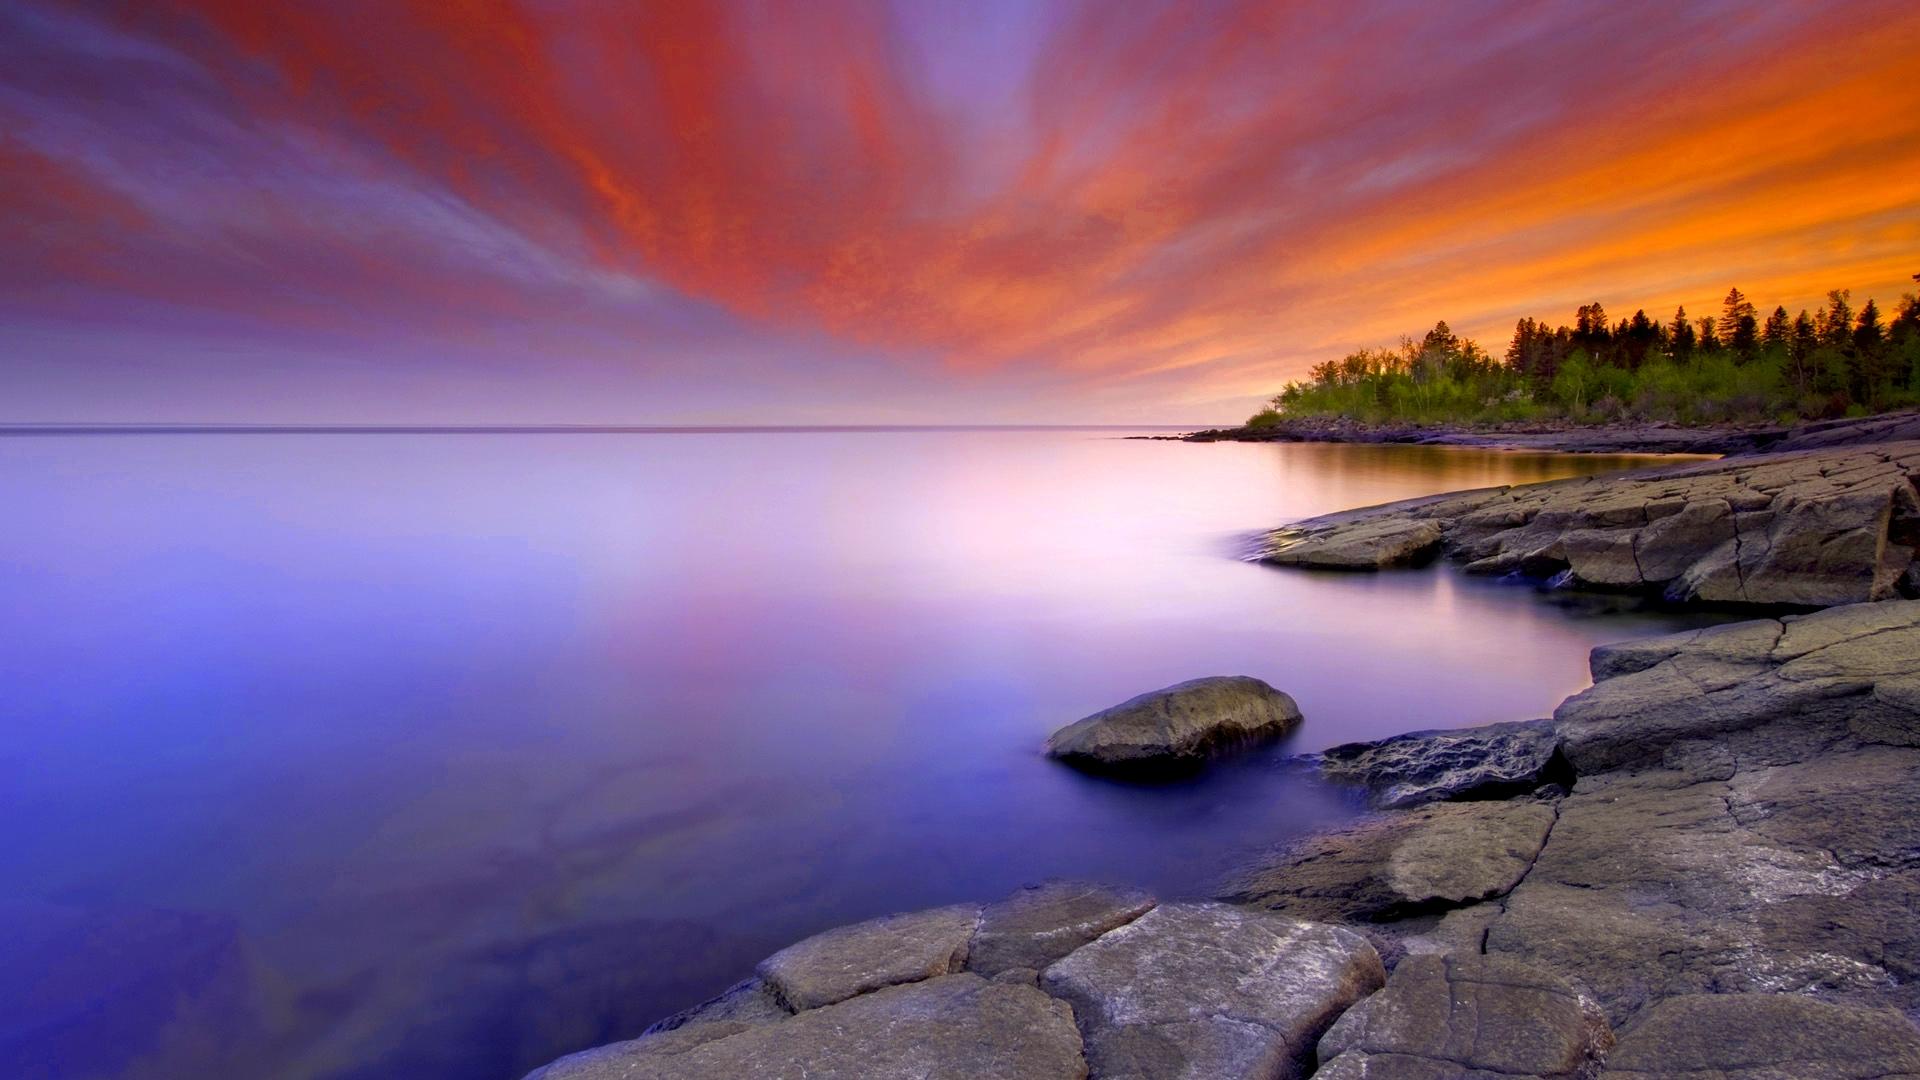 sunset-serenity-242836.jpg